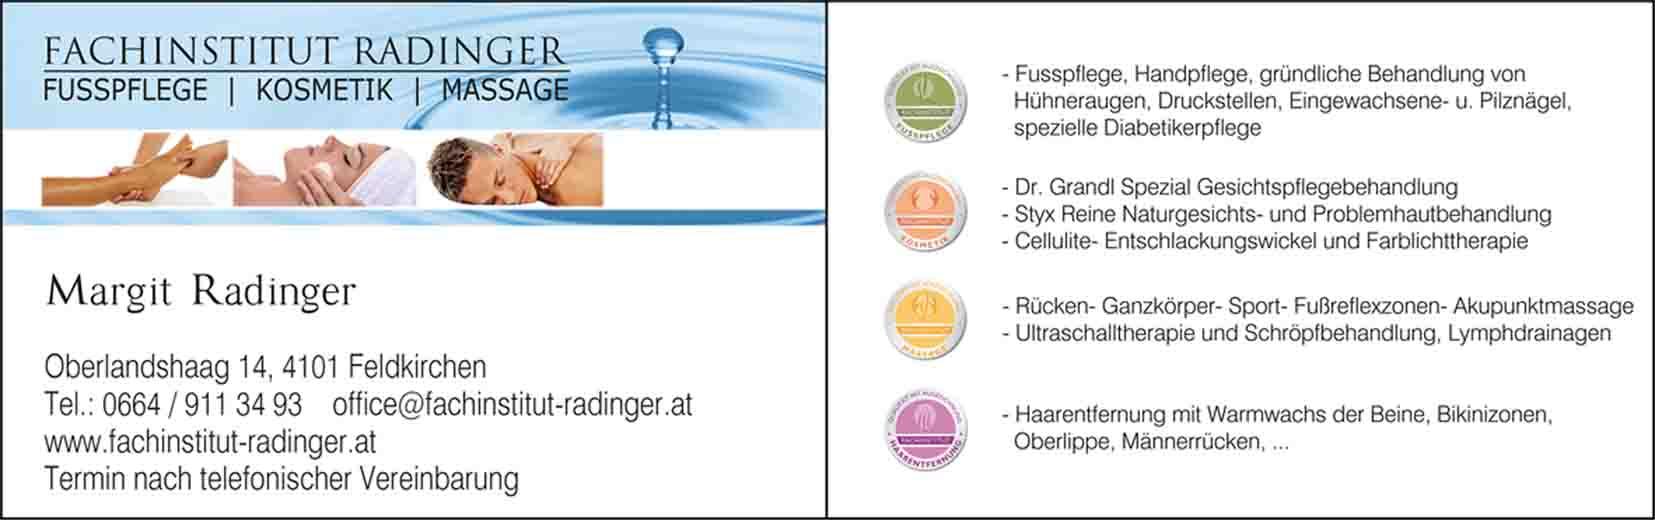 Fachinstitut Radinger Fußpflege Kosmetik Massage